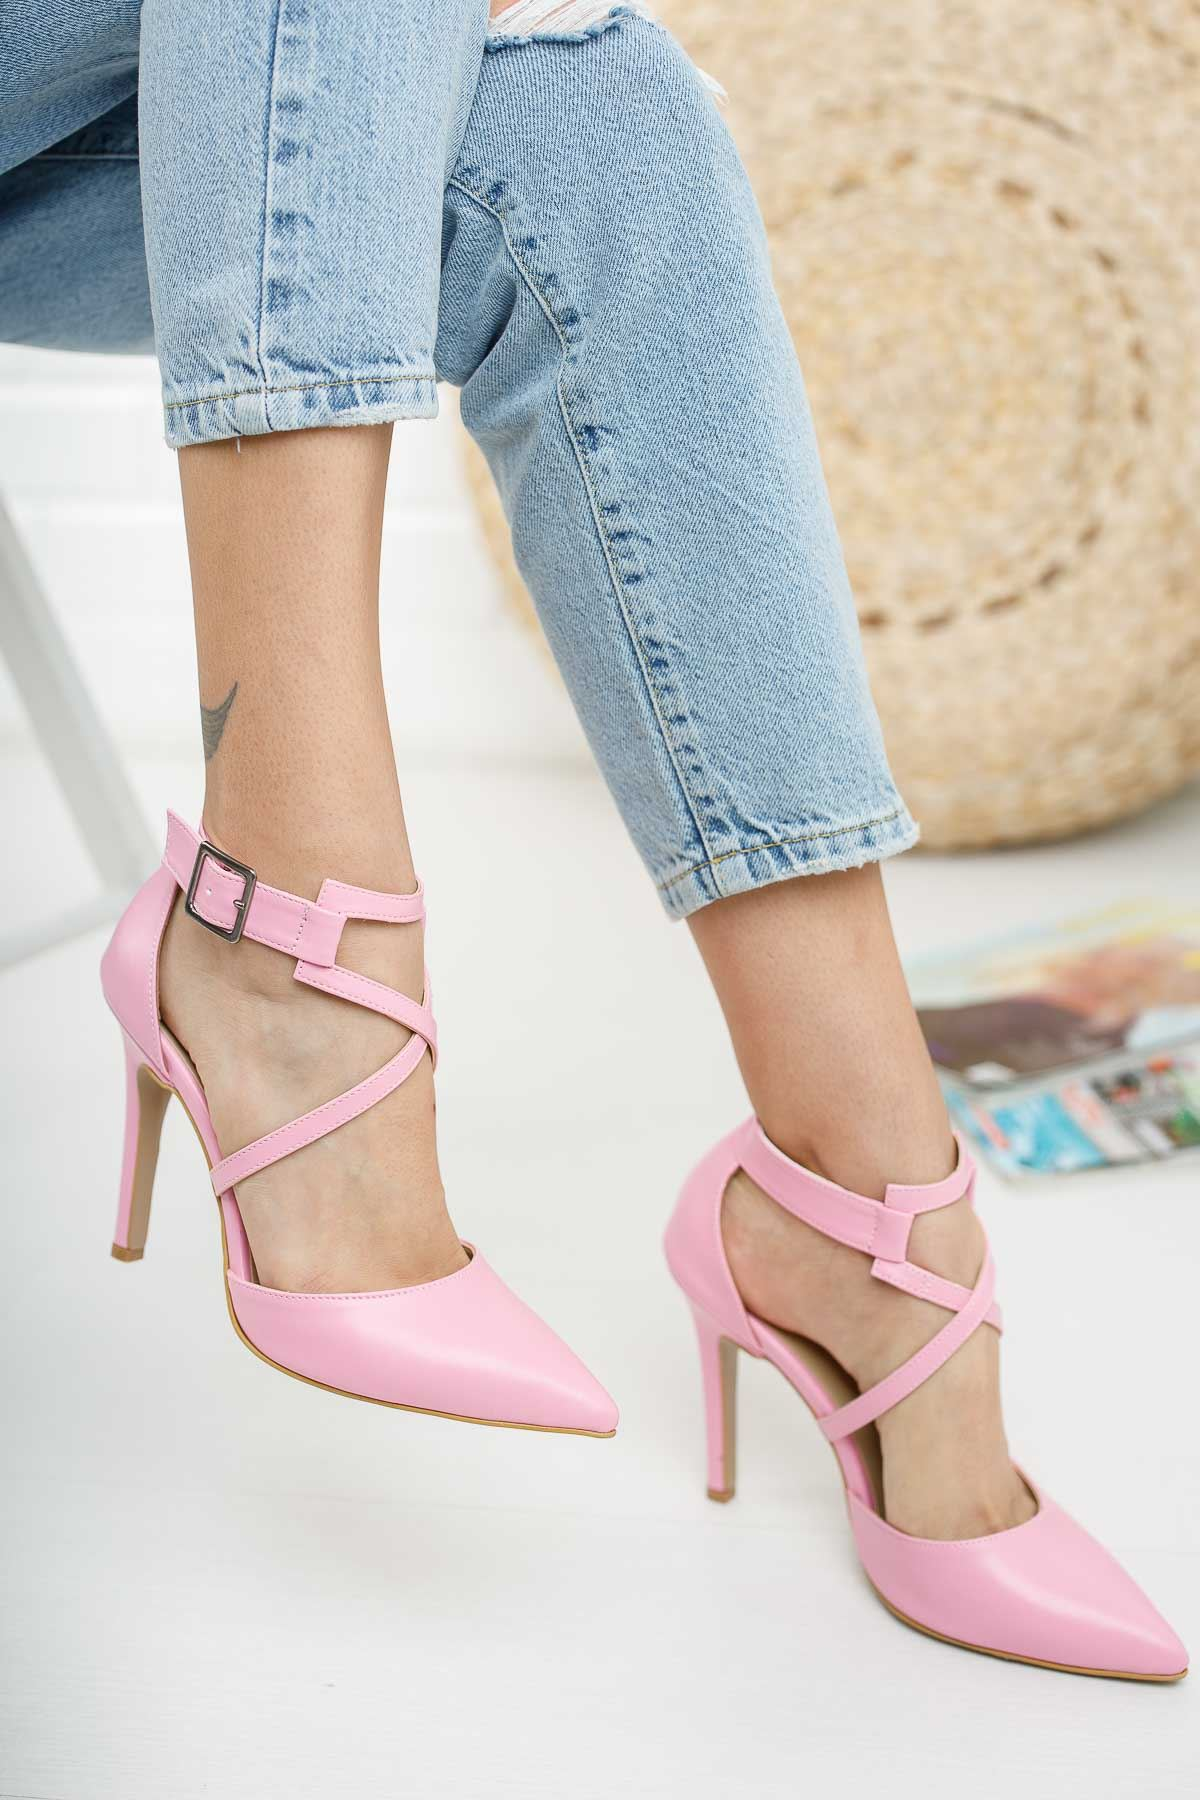 Edrie Pembe Cilt Topuklu Ayakkabı Stiletto